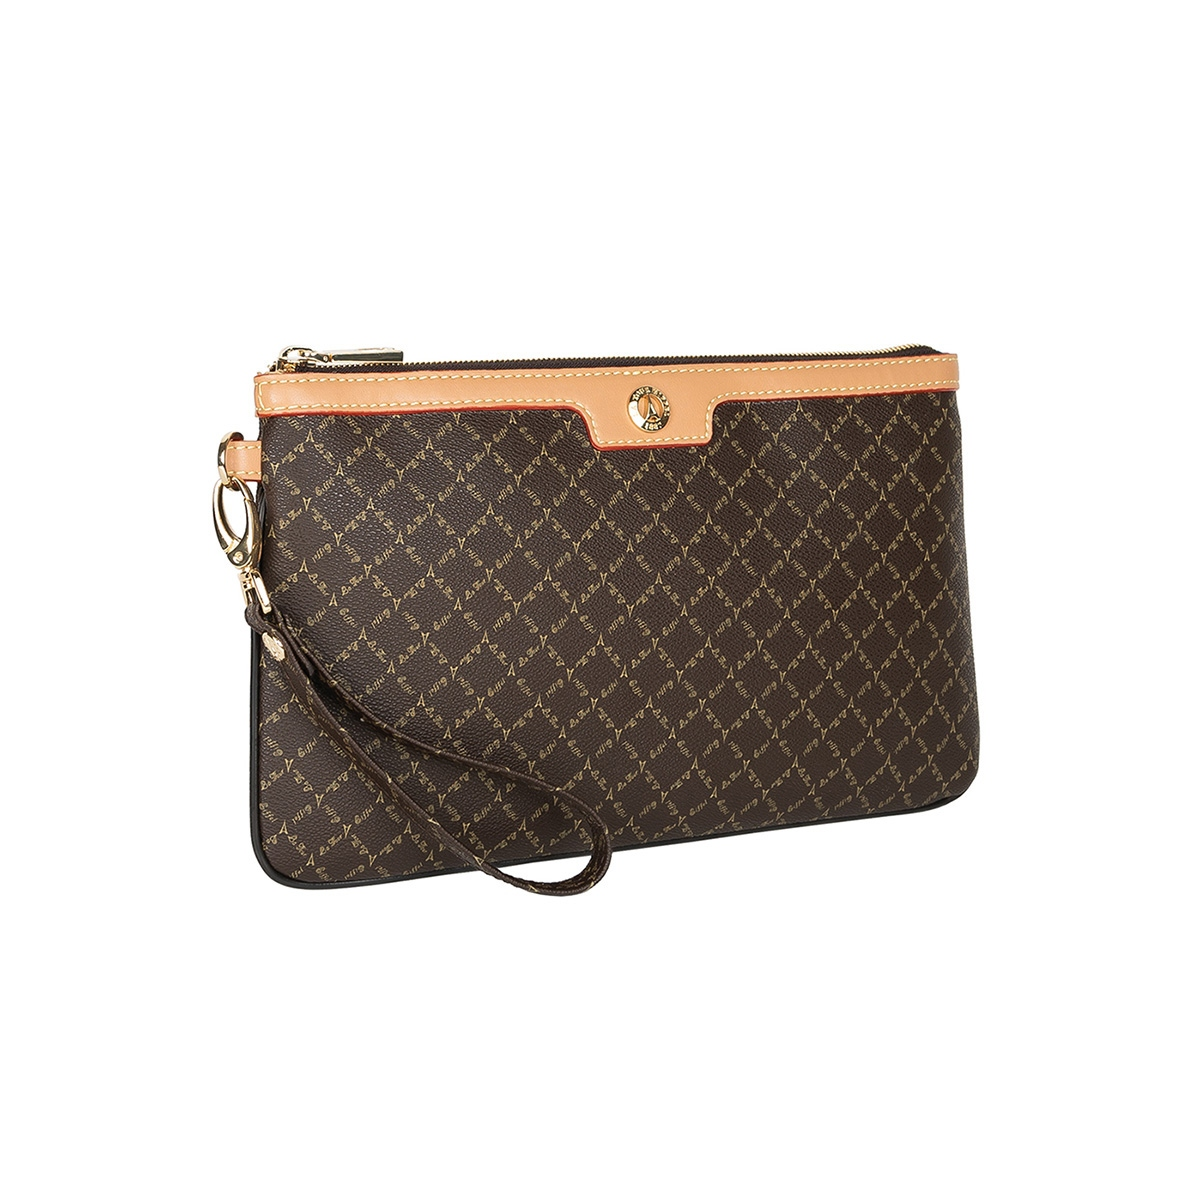 8efe8286bd Τσάντα Φάκελος Με Λαβή La Tour Eiffel Logo-Δέρμα 151006 Καφέ-Μπεζ ...